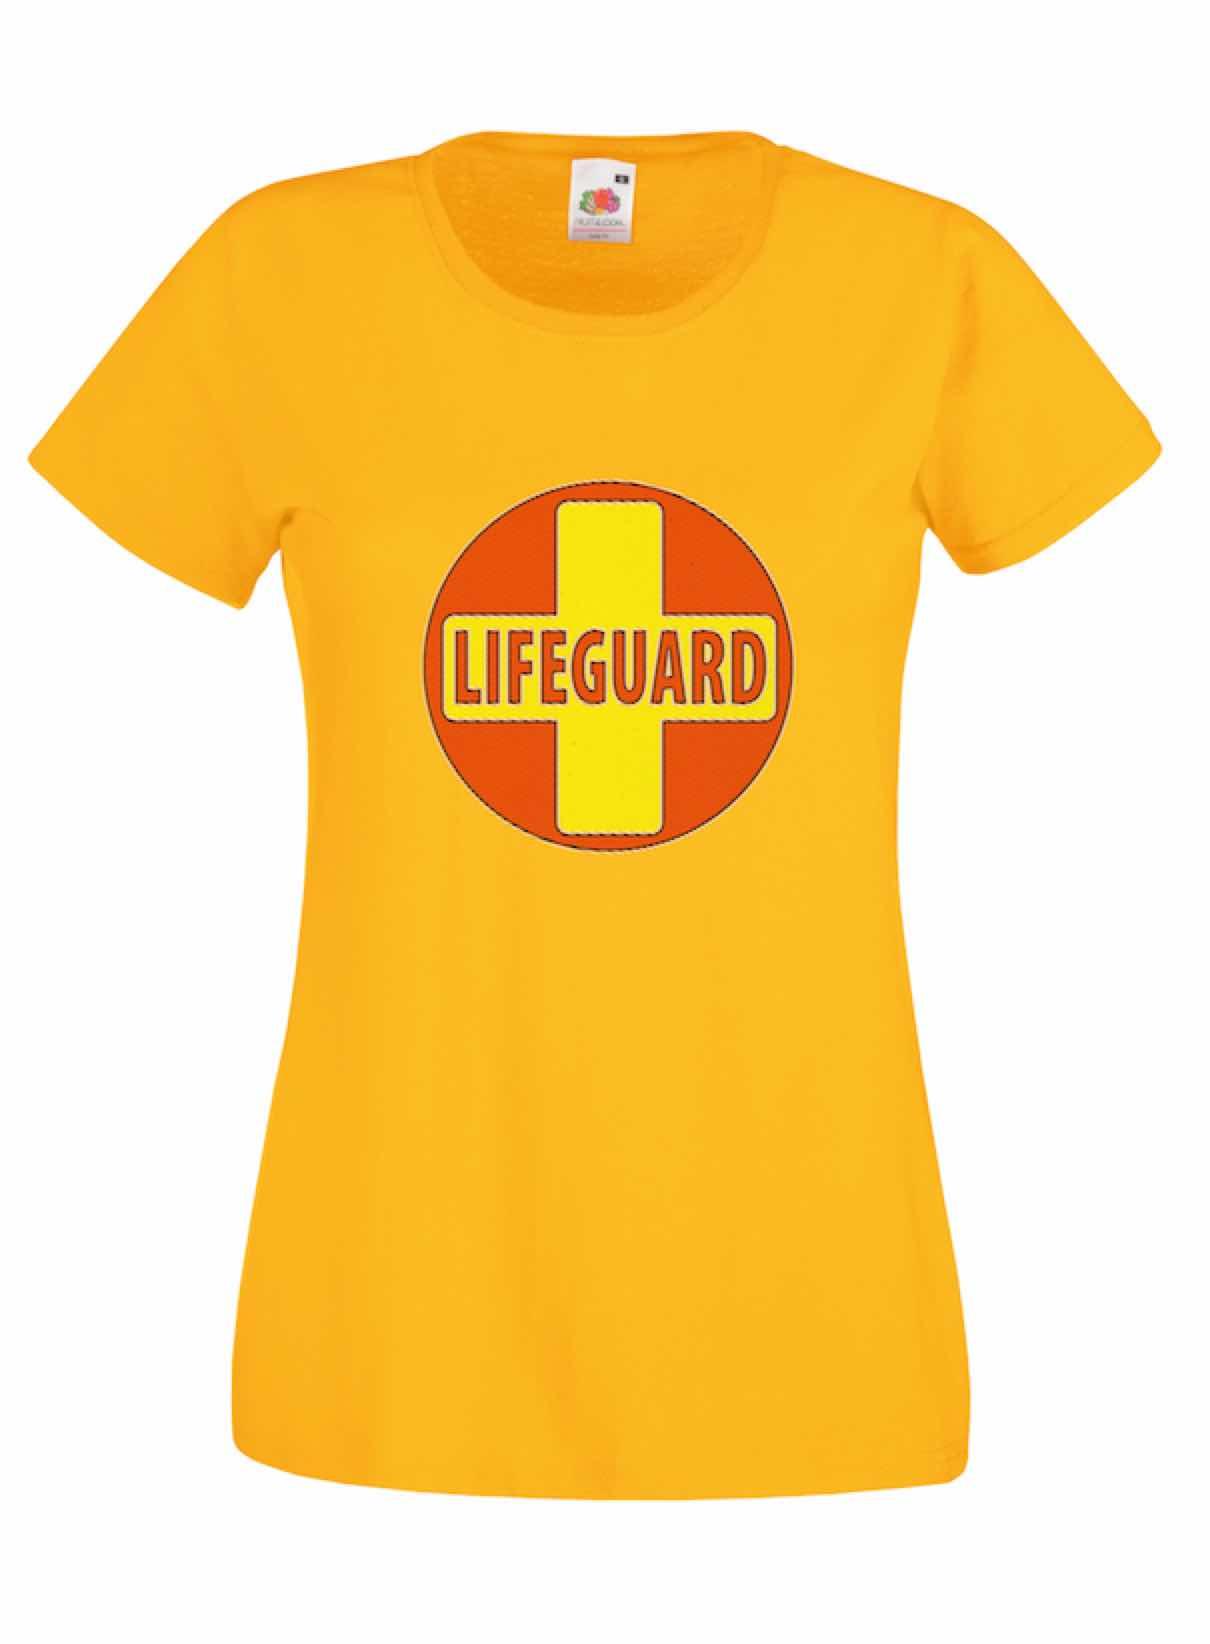 Lifeguard design for t-shirt, hoodie & sweatshirt